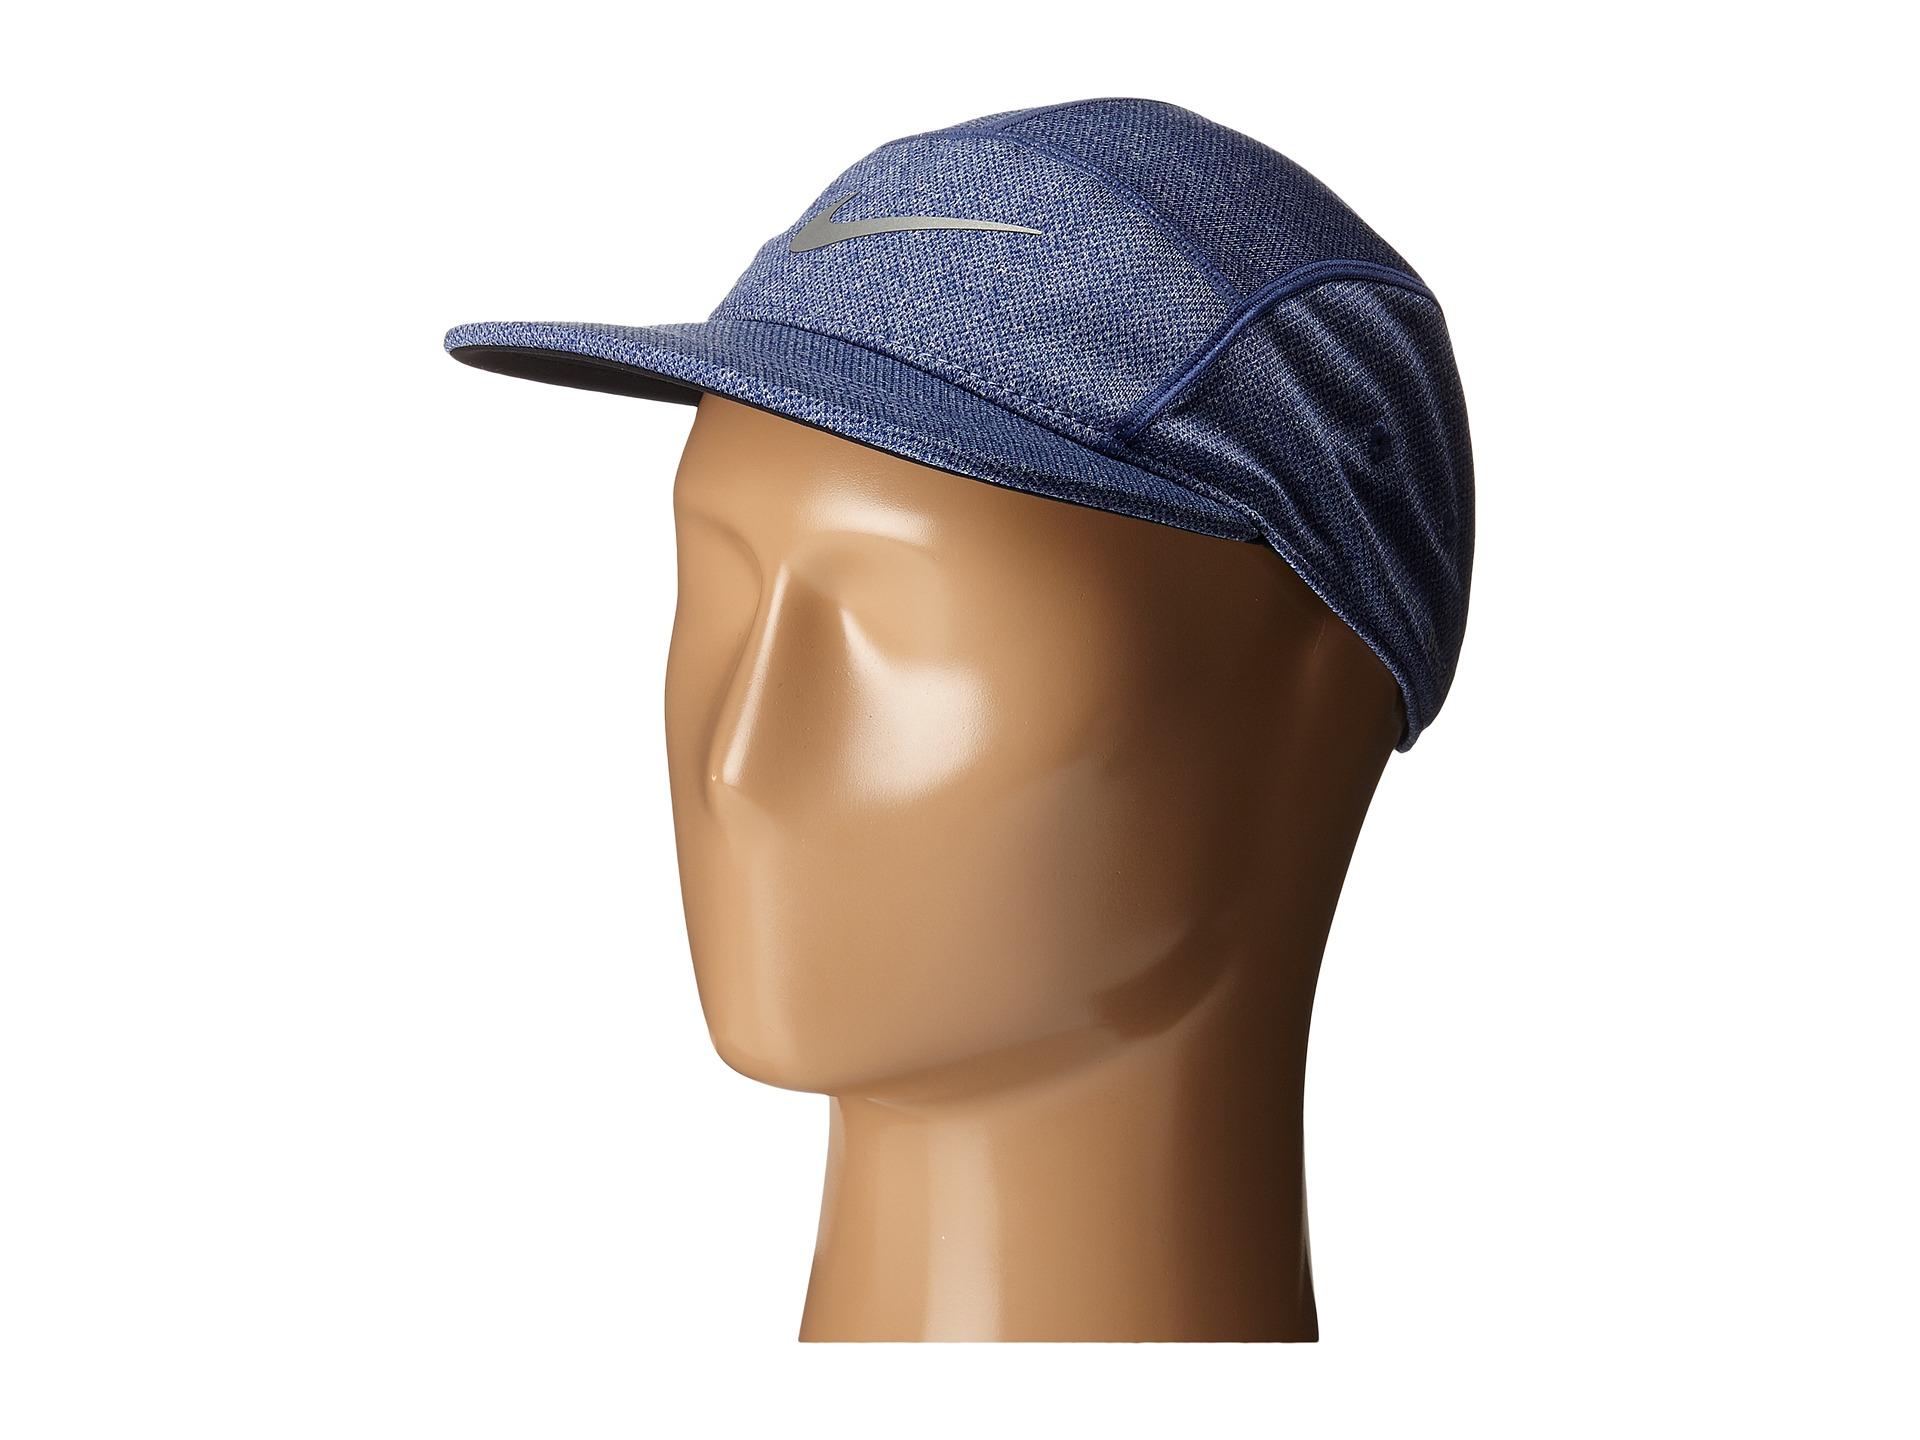 cba362db1cb59 Nike Run Dri-fit Knit Aw84 Hat in Blue for Men - Lyst